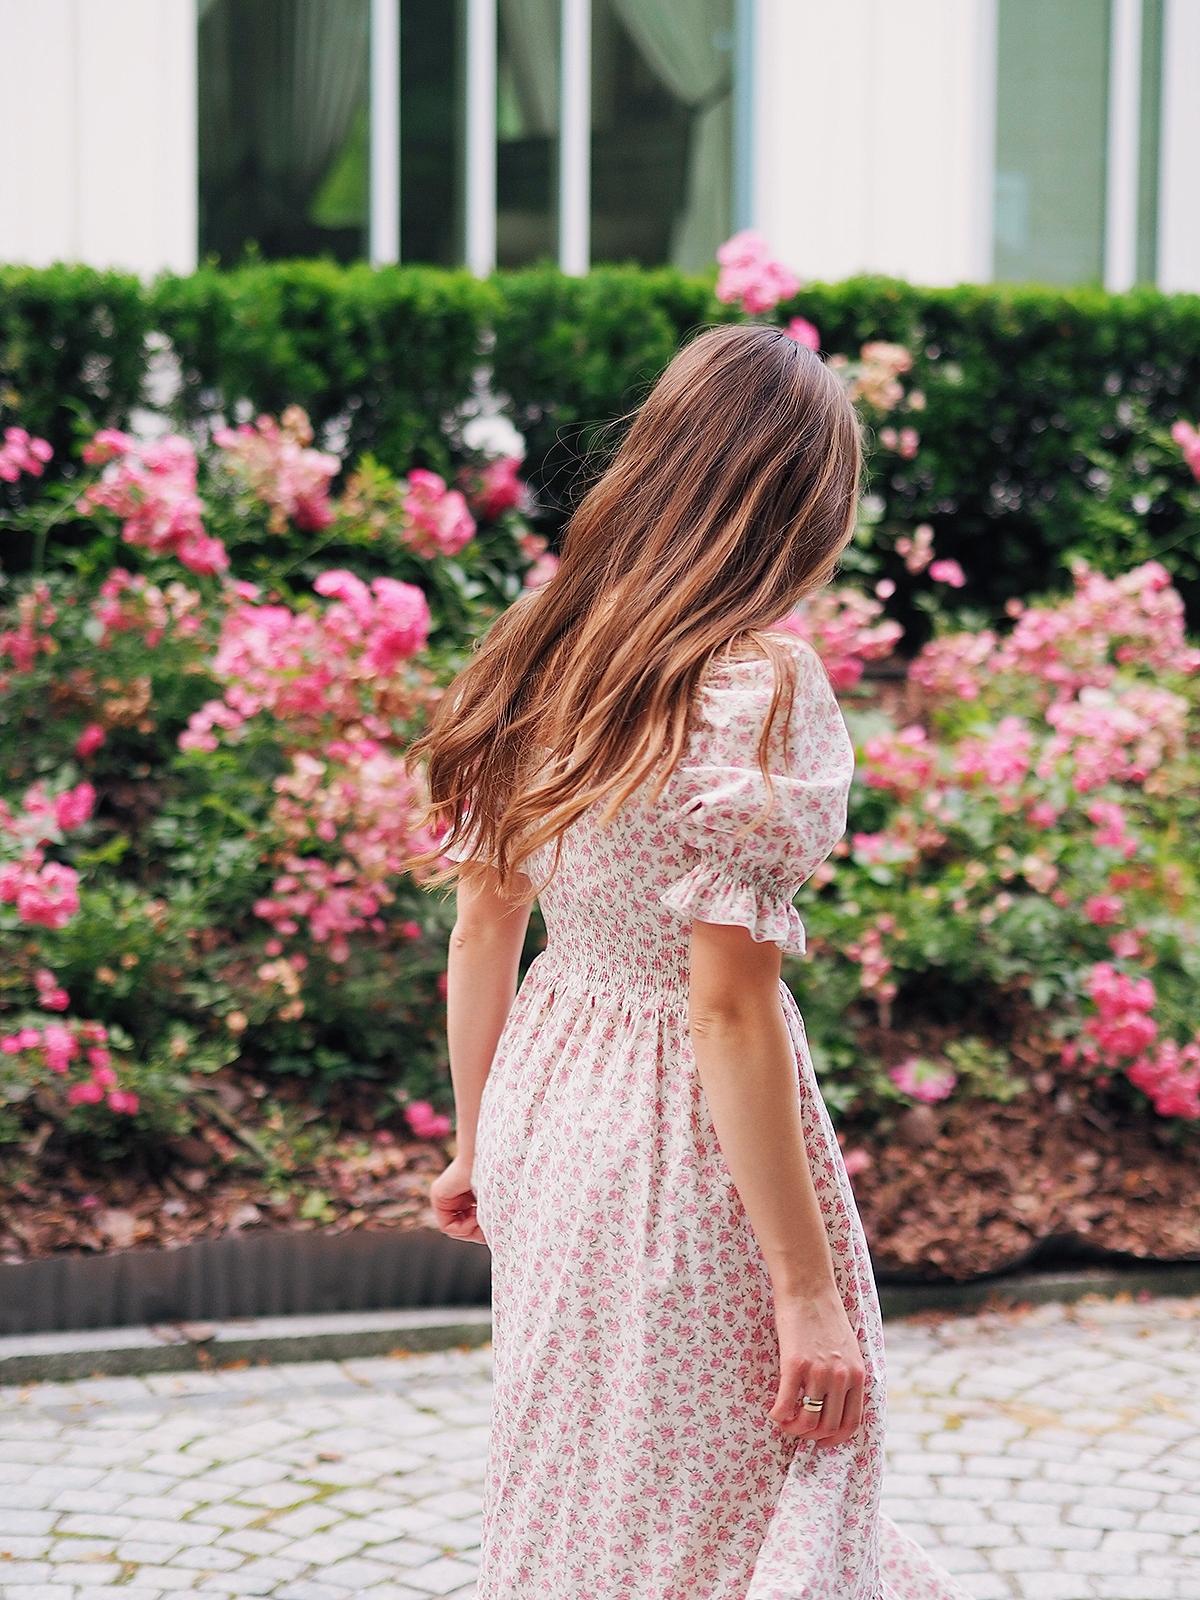 Sukienka Rose - Romantyczna kolekacja sukienek